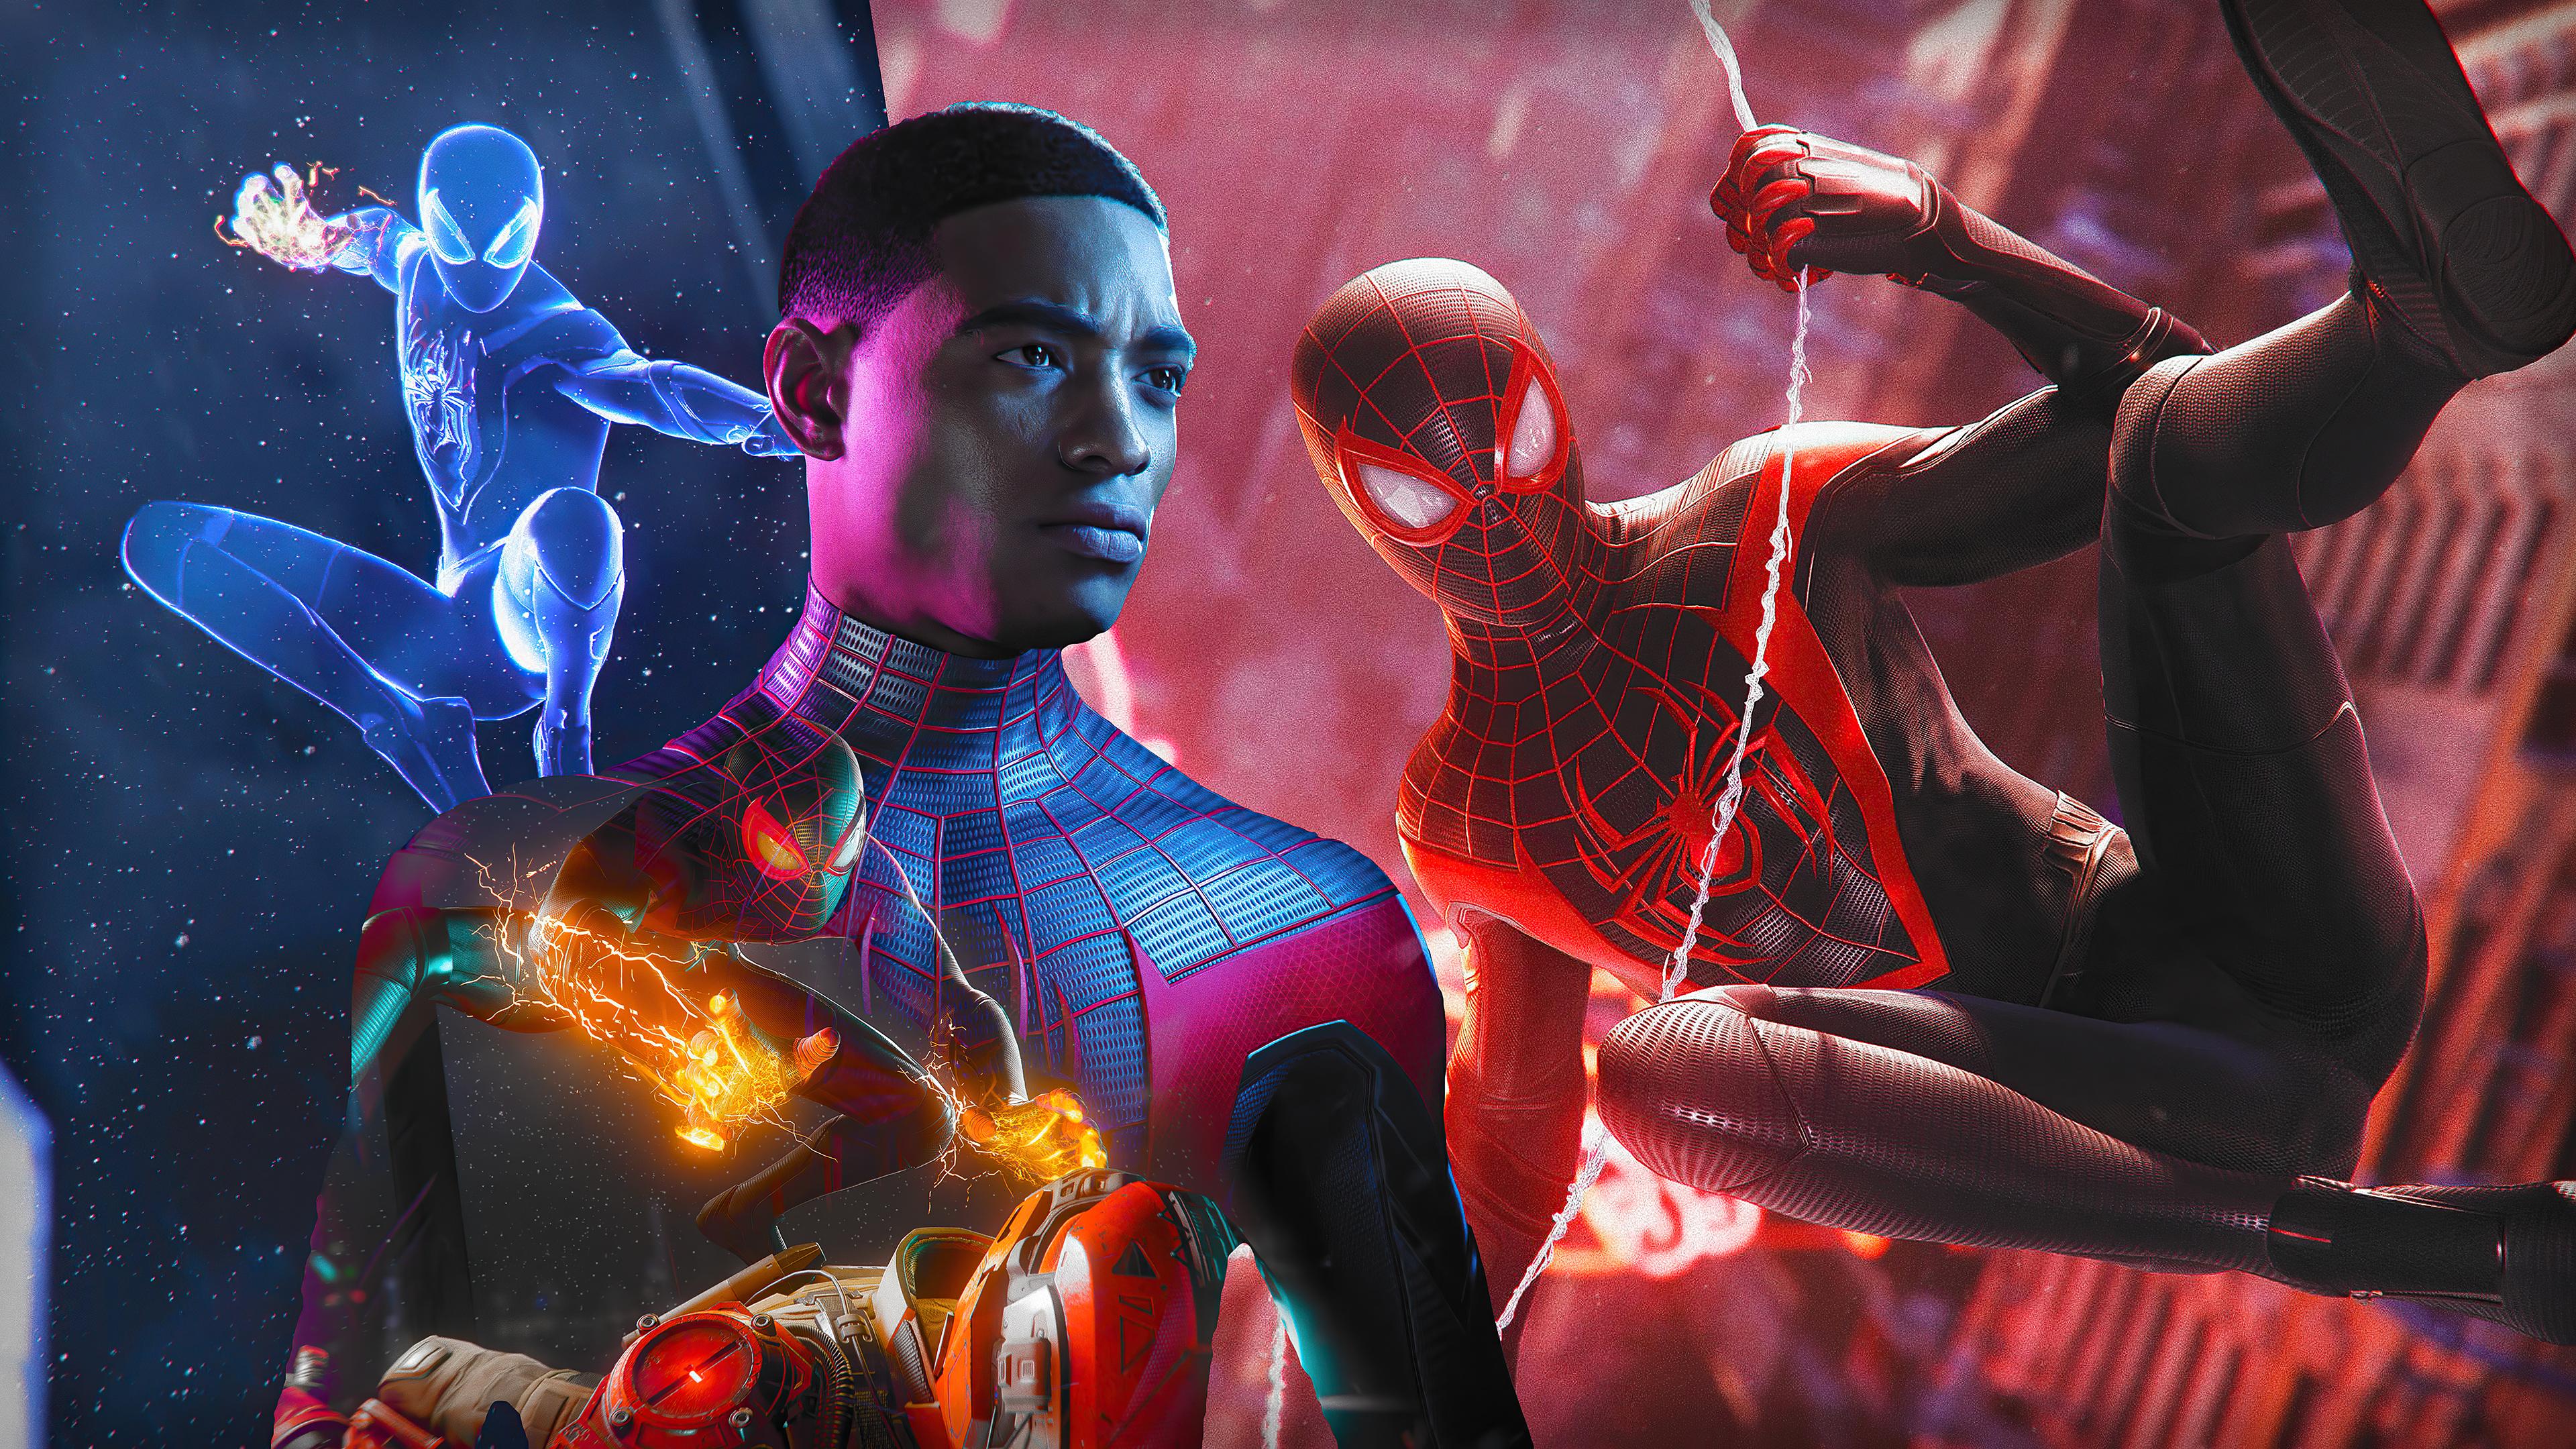 Marvel S Spider Man Miles Morales 4k Wallpaper Playstation 5 2020 Games Games 1280